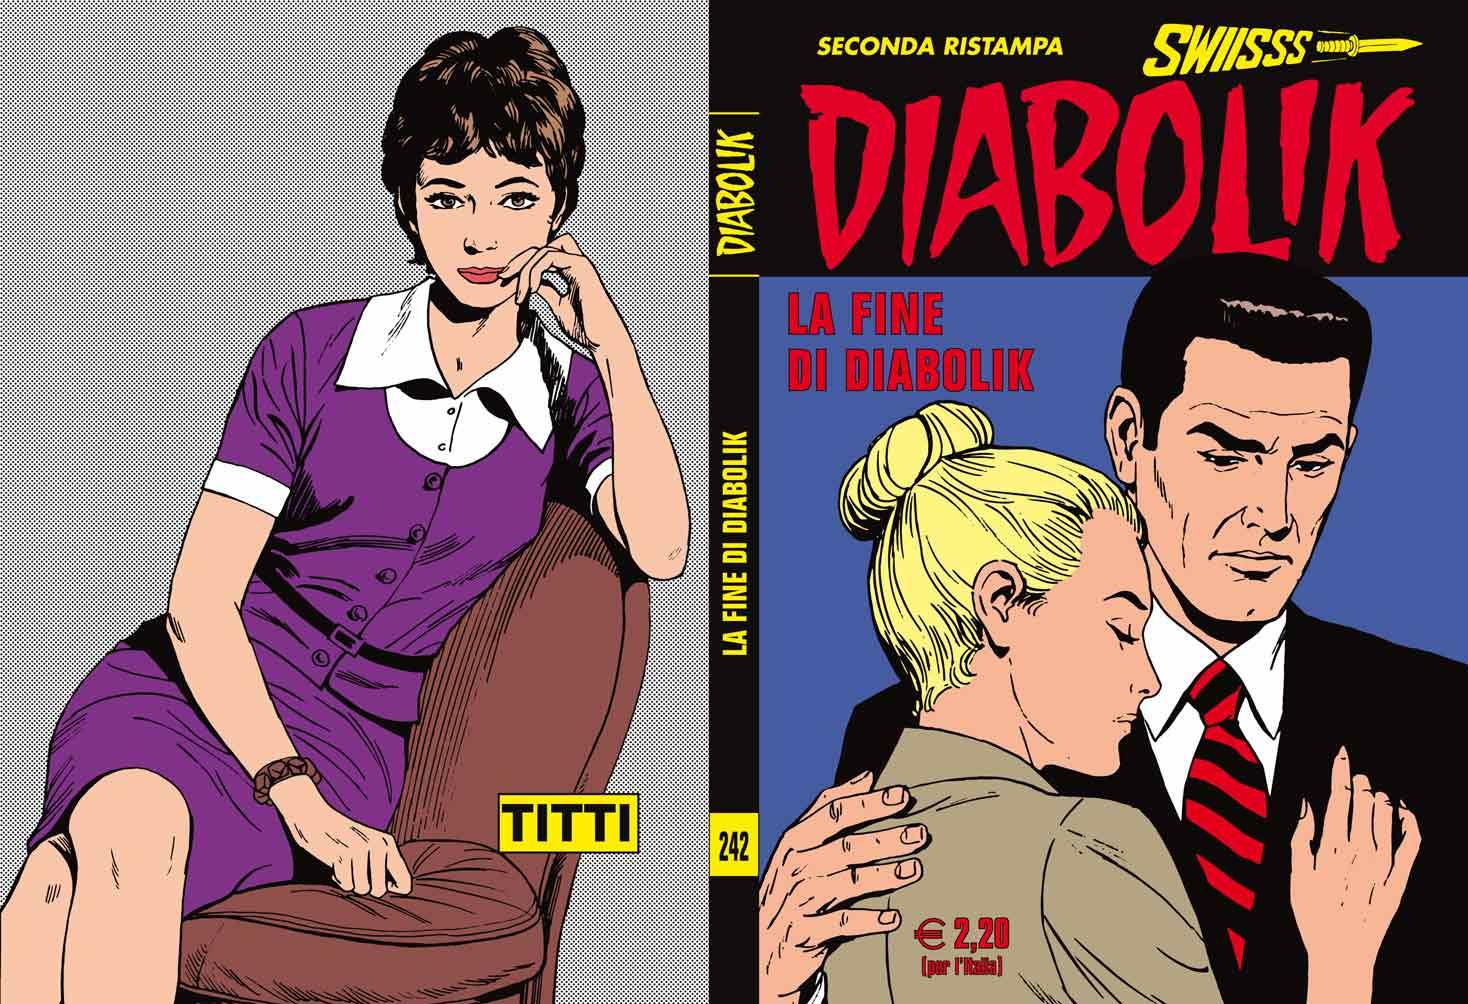 Fumetti ASTORINA SRL, Collana DIABOLIK SWIISSS